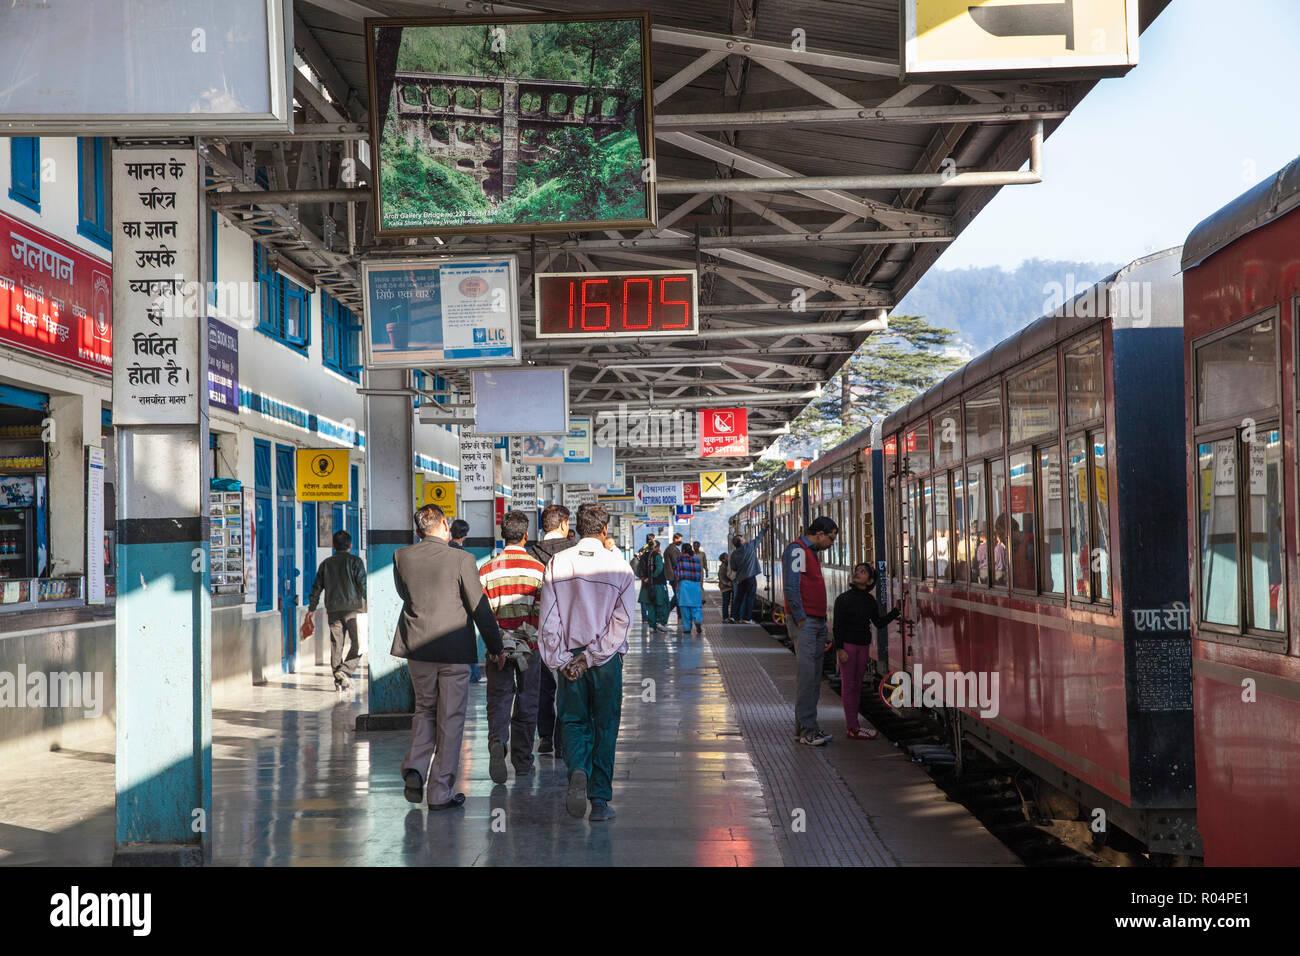 The Himalayan Queen toy train at Shimla railway station, at the end of the Kalka to Shimla Railway, UNESCO, Shimla (Simla), Himachal Pradesh, India - Stock Image